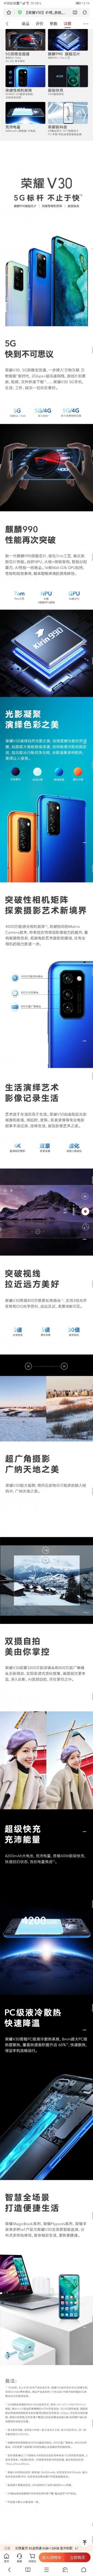 Screenshot_20191212_121442_com.qihoo.contents.jpg